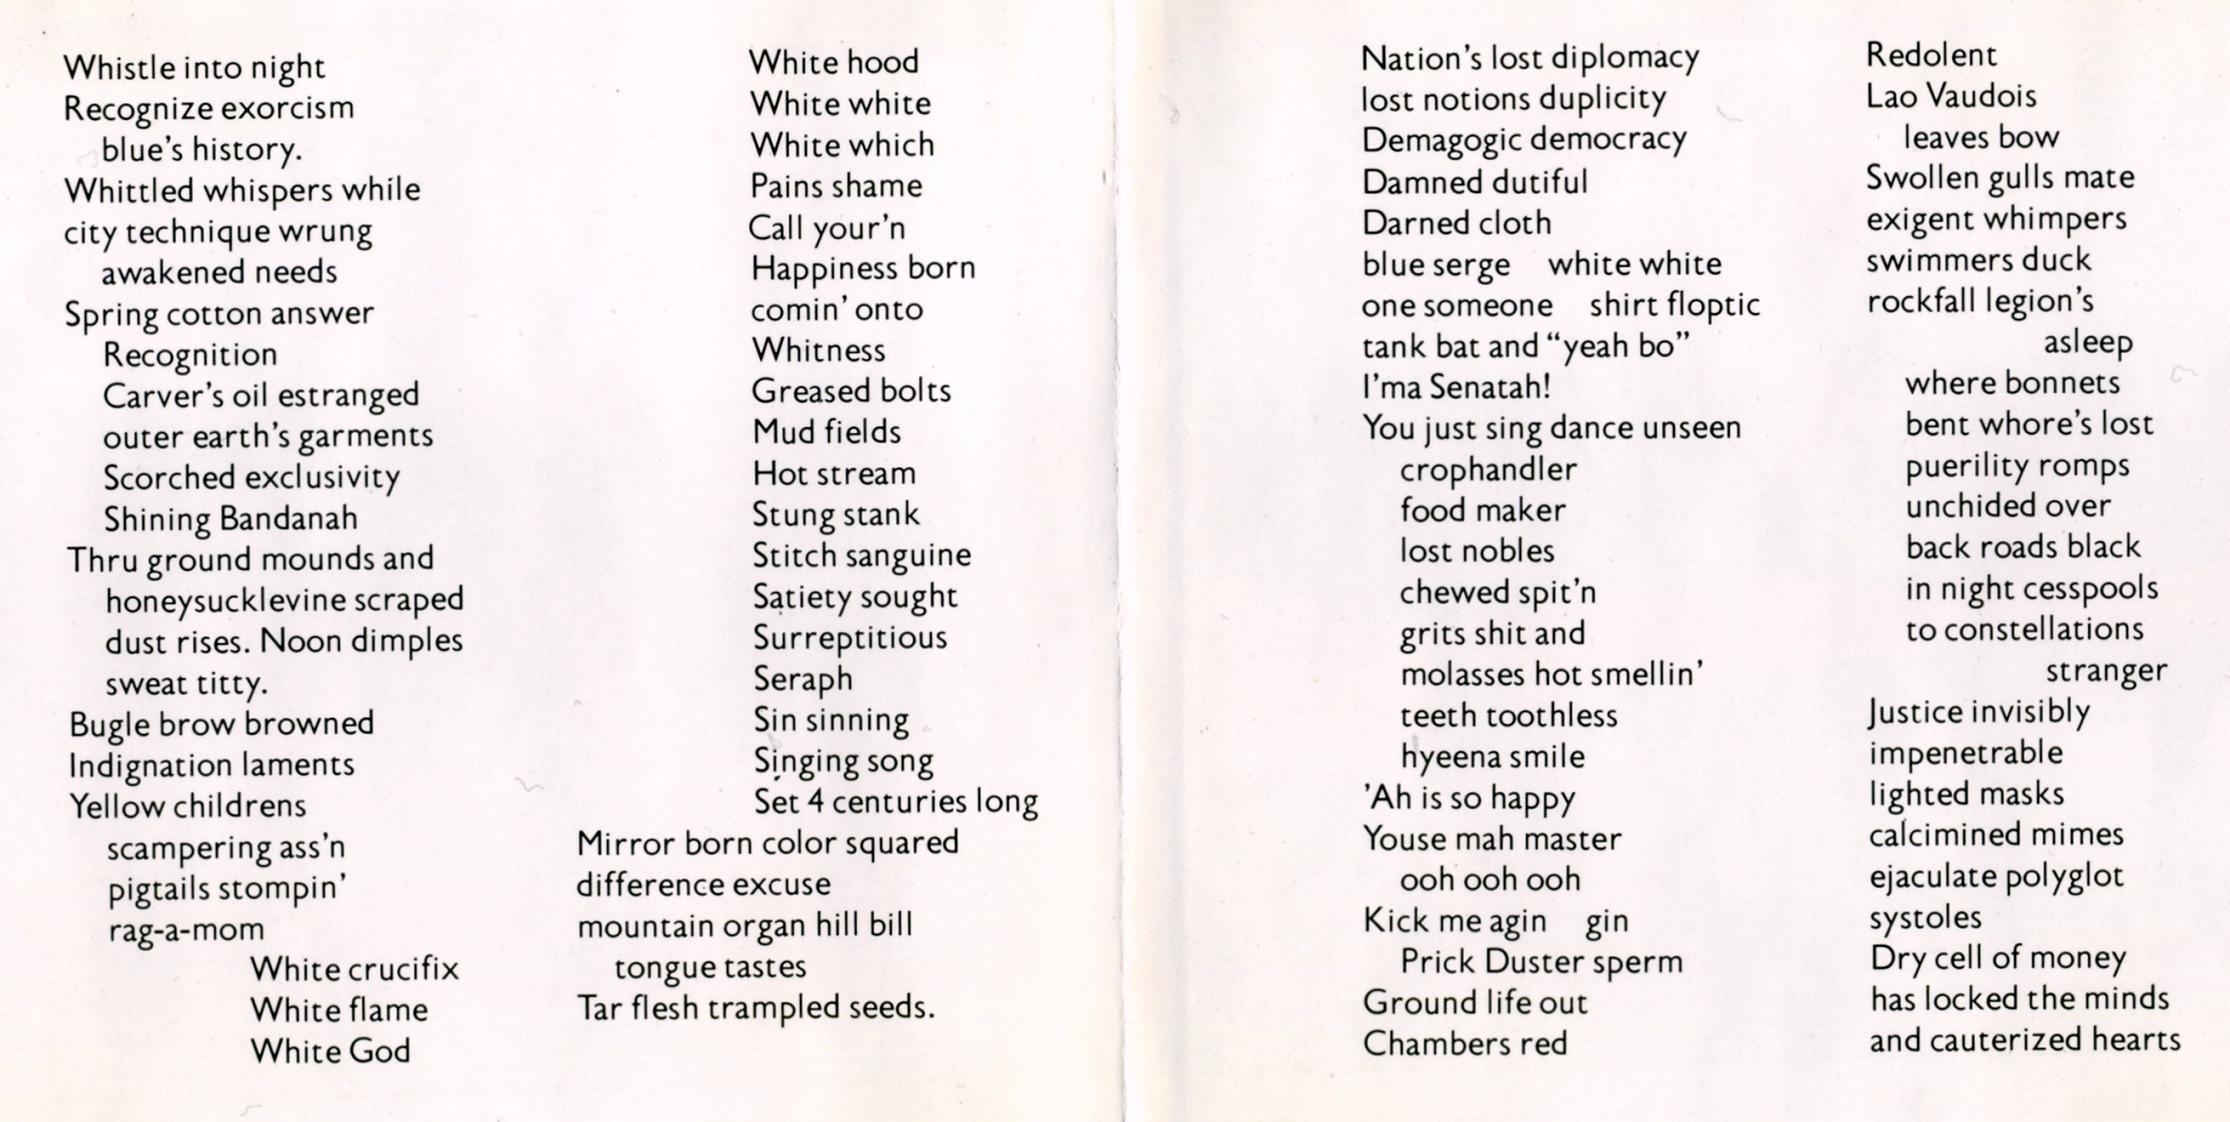 cecil taylor indent liner notes (4)